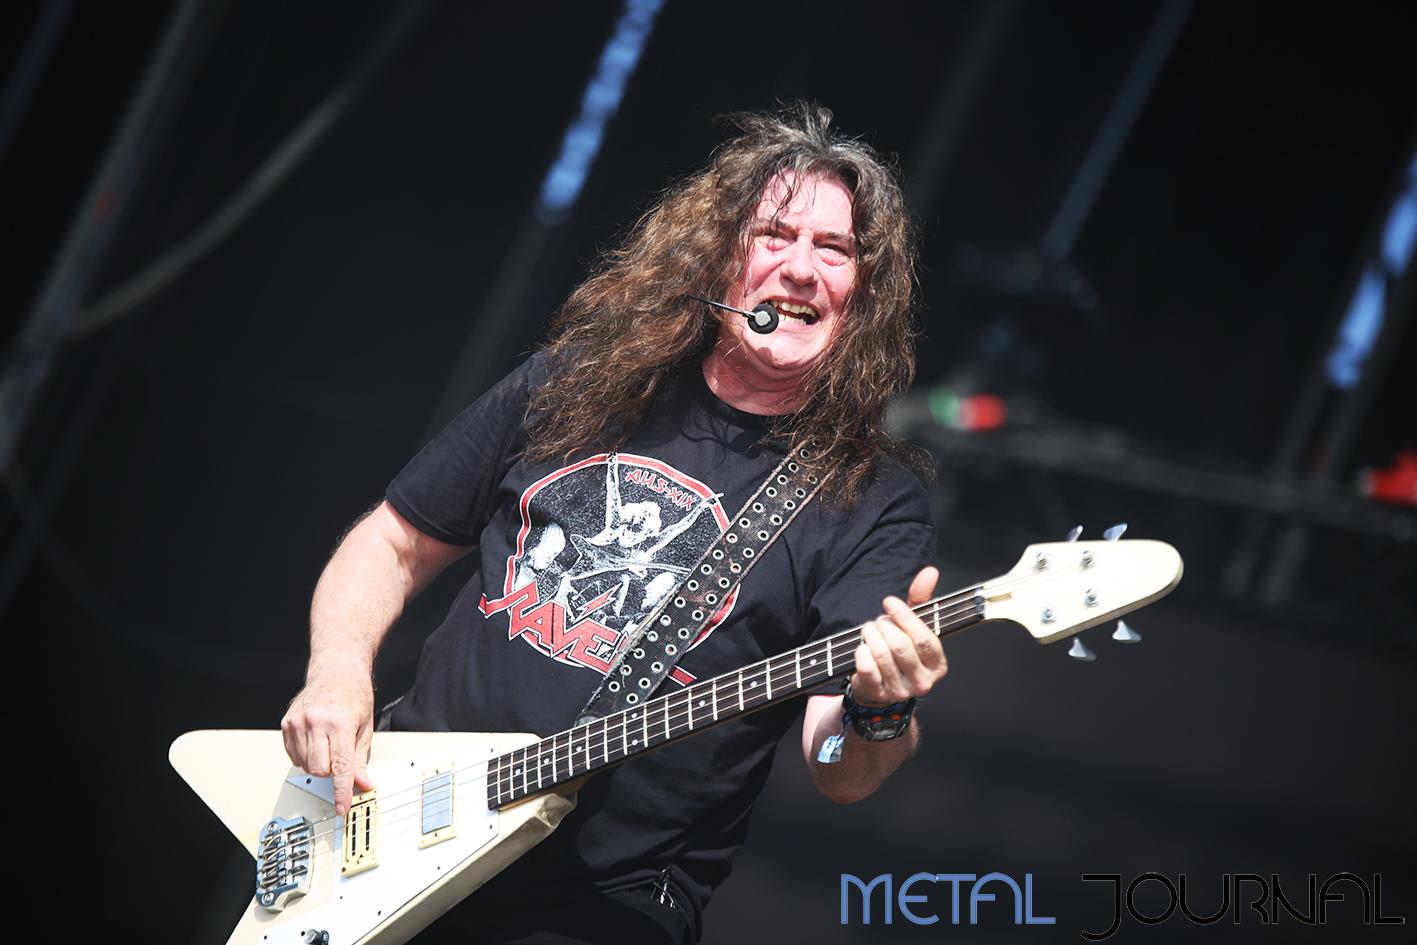 raven - metal journal rock fest barcelona 2019 pic 6